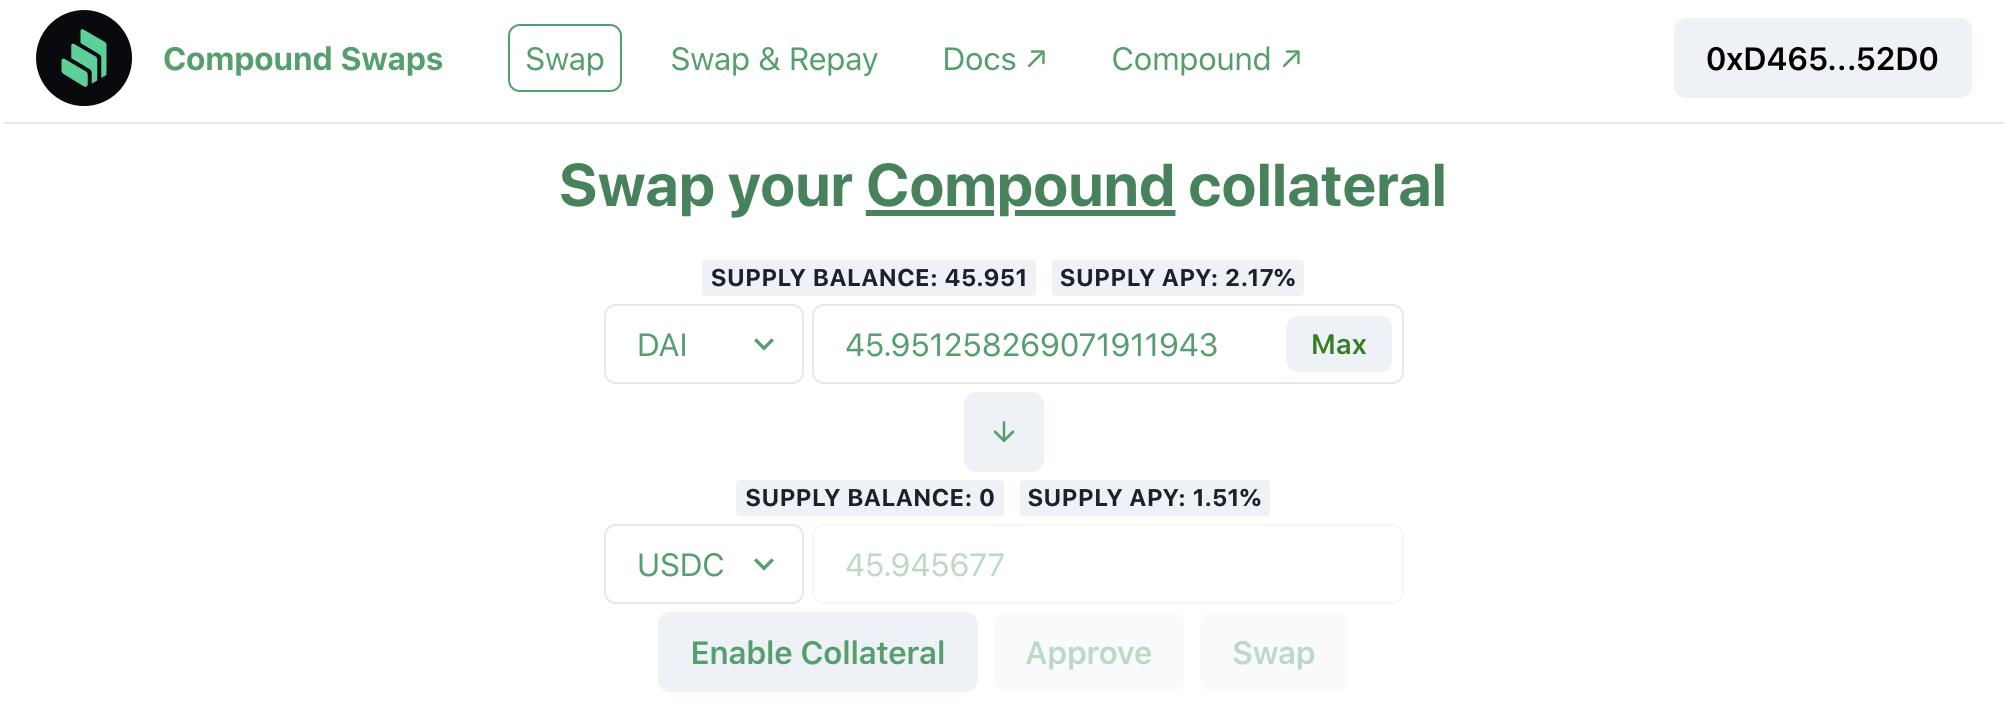 Compound Swaps showcase